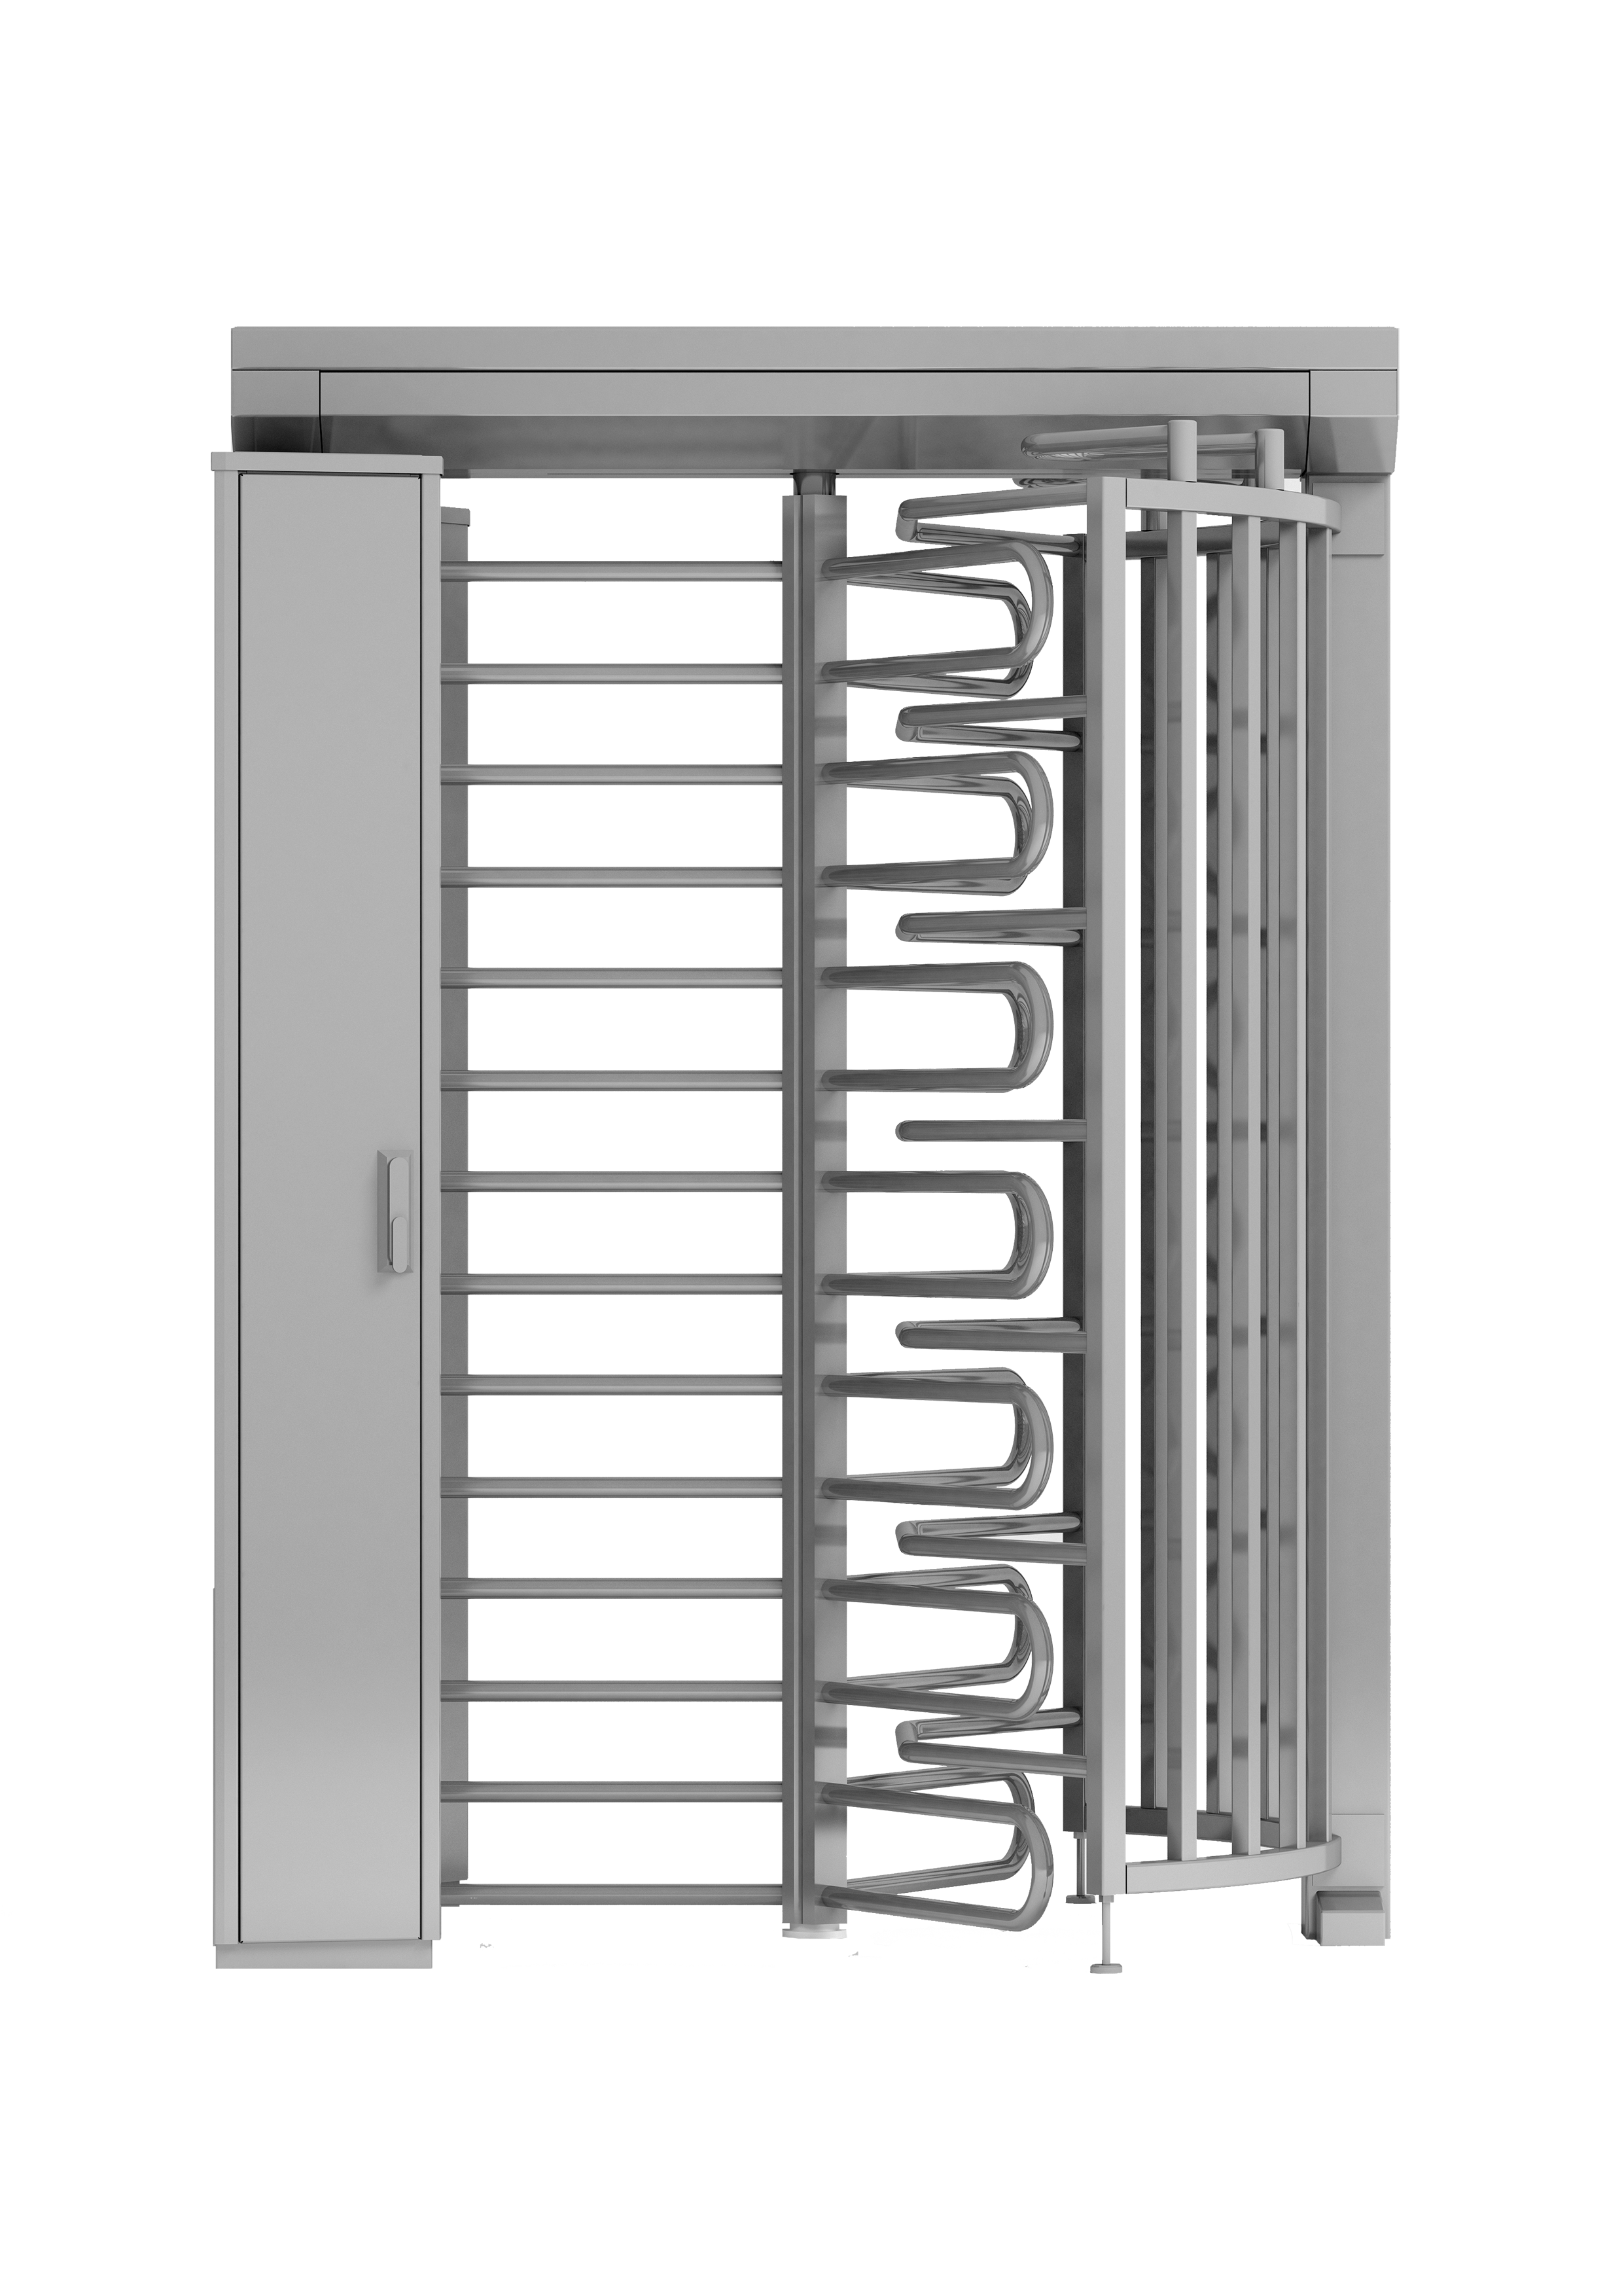 ECCO.120.BB_front